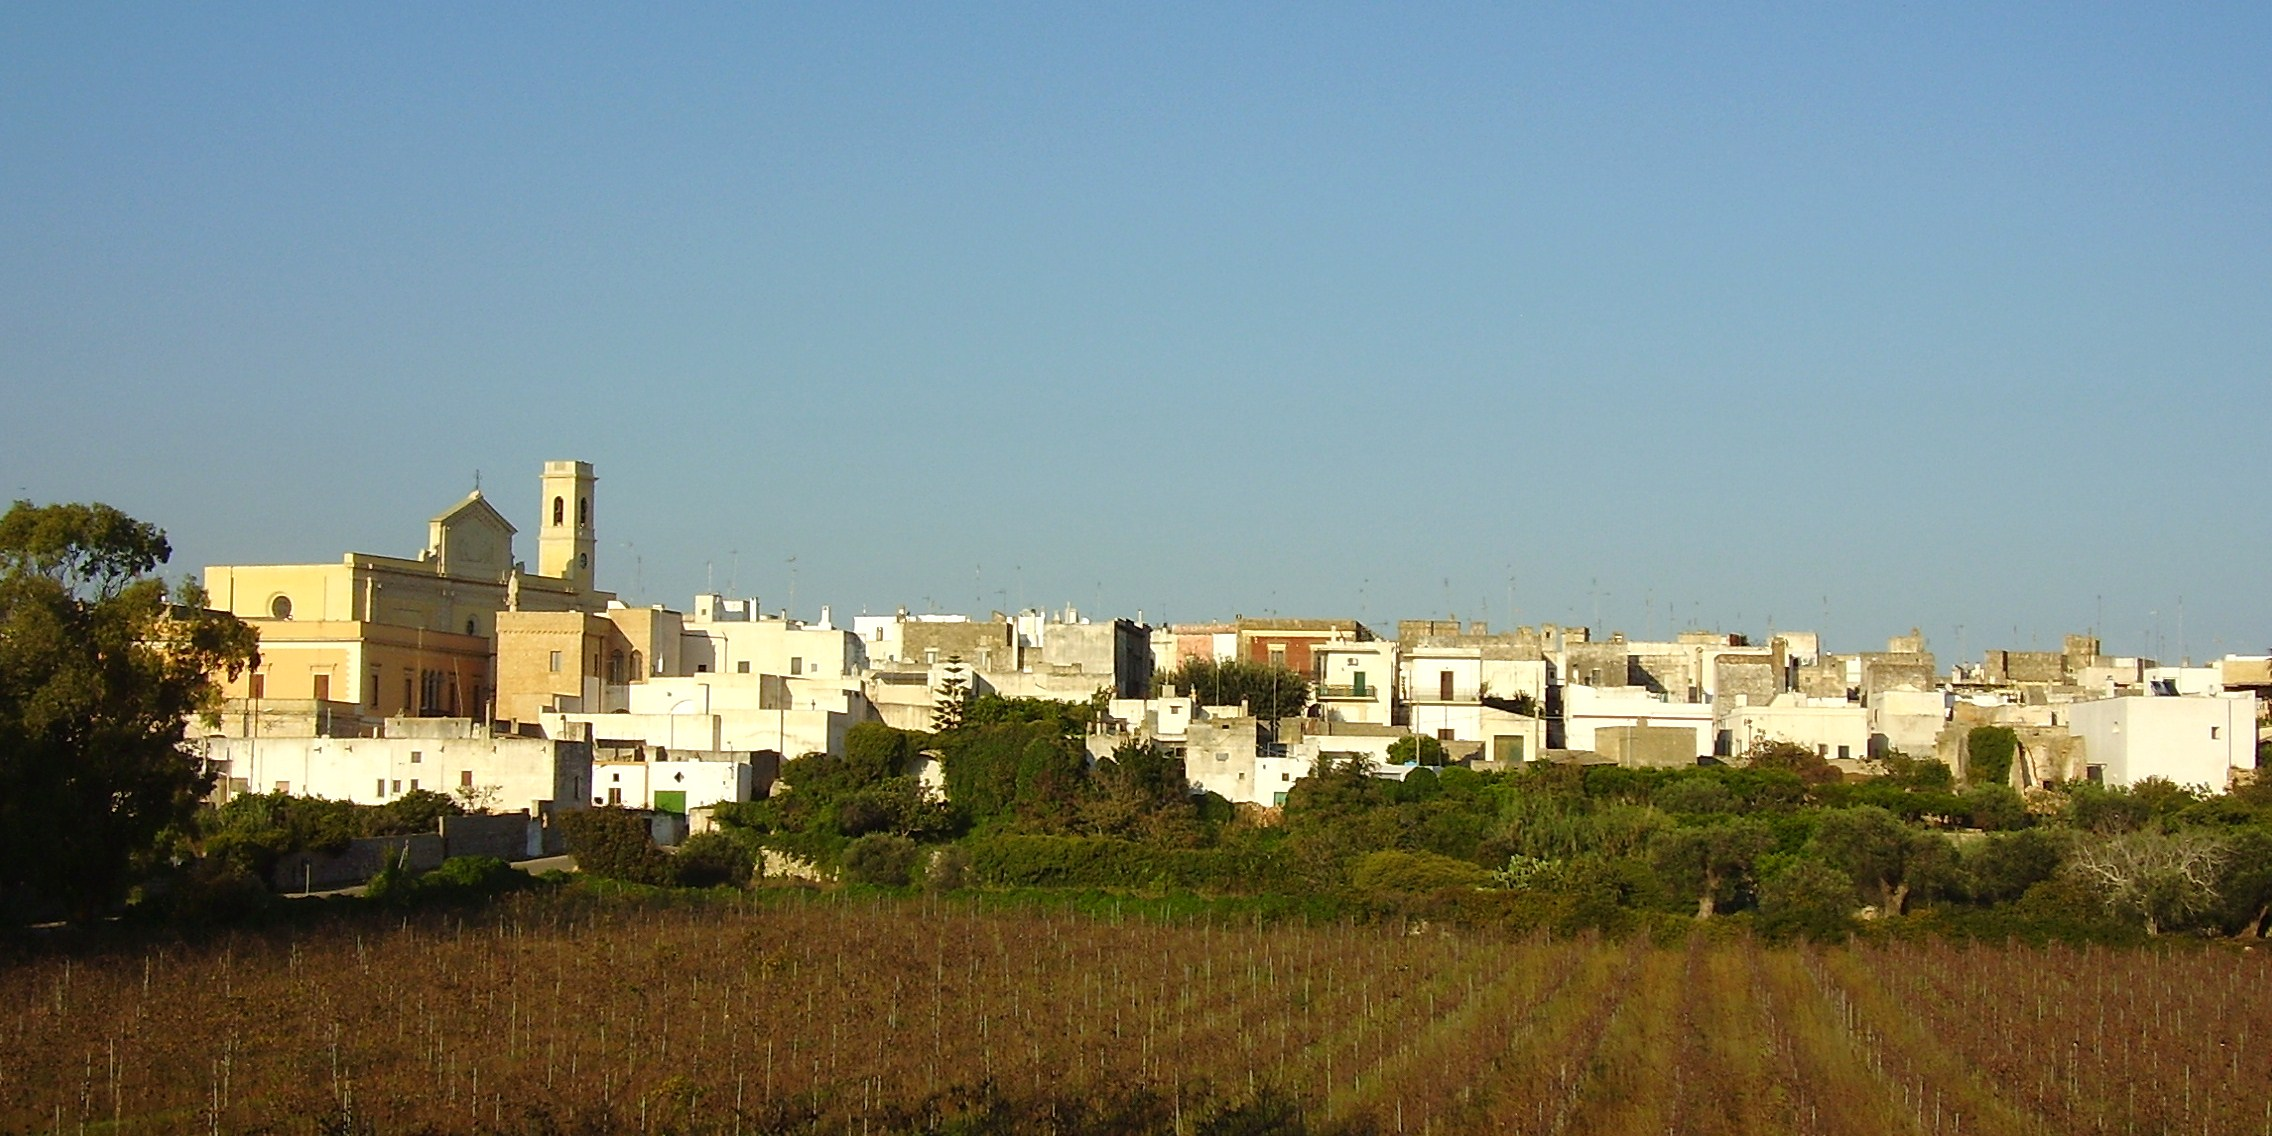 Salve Puglia Cartina.Salve Apulia Wikipedia